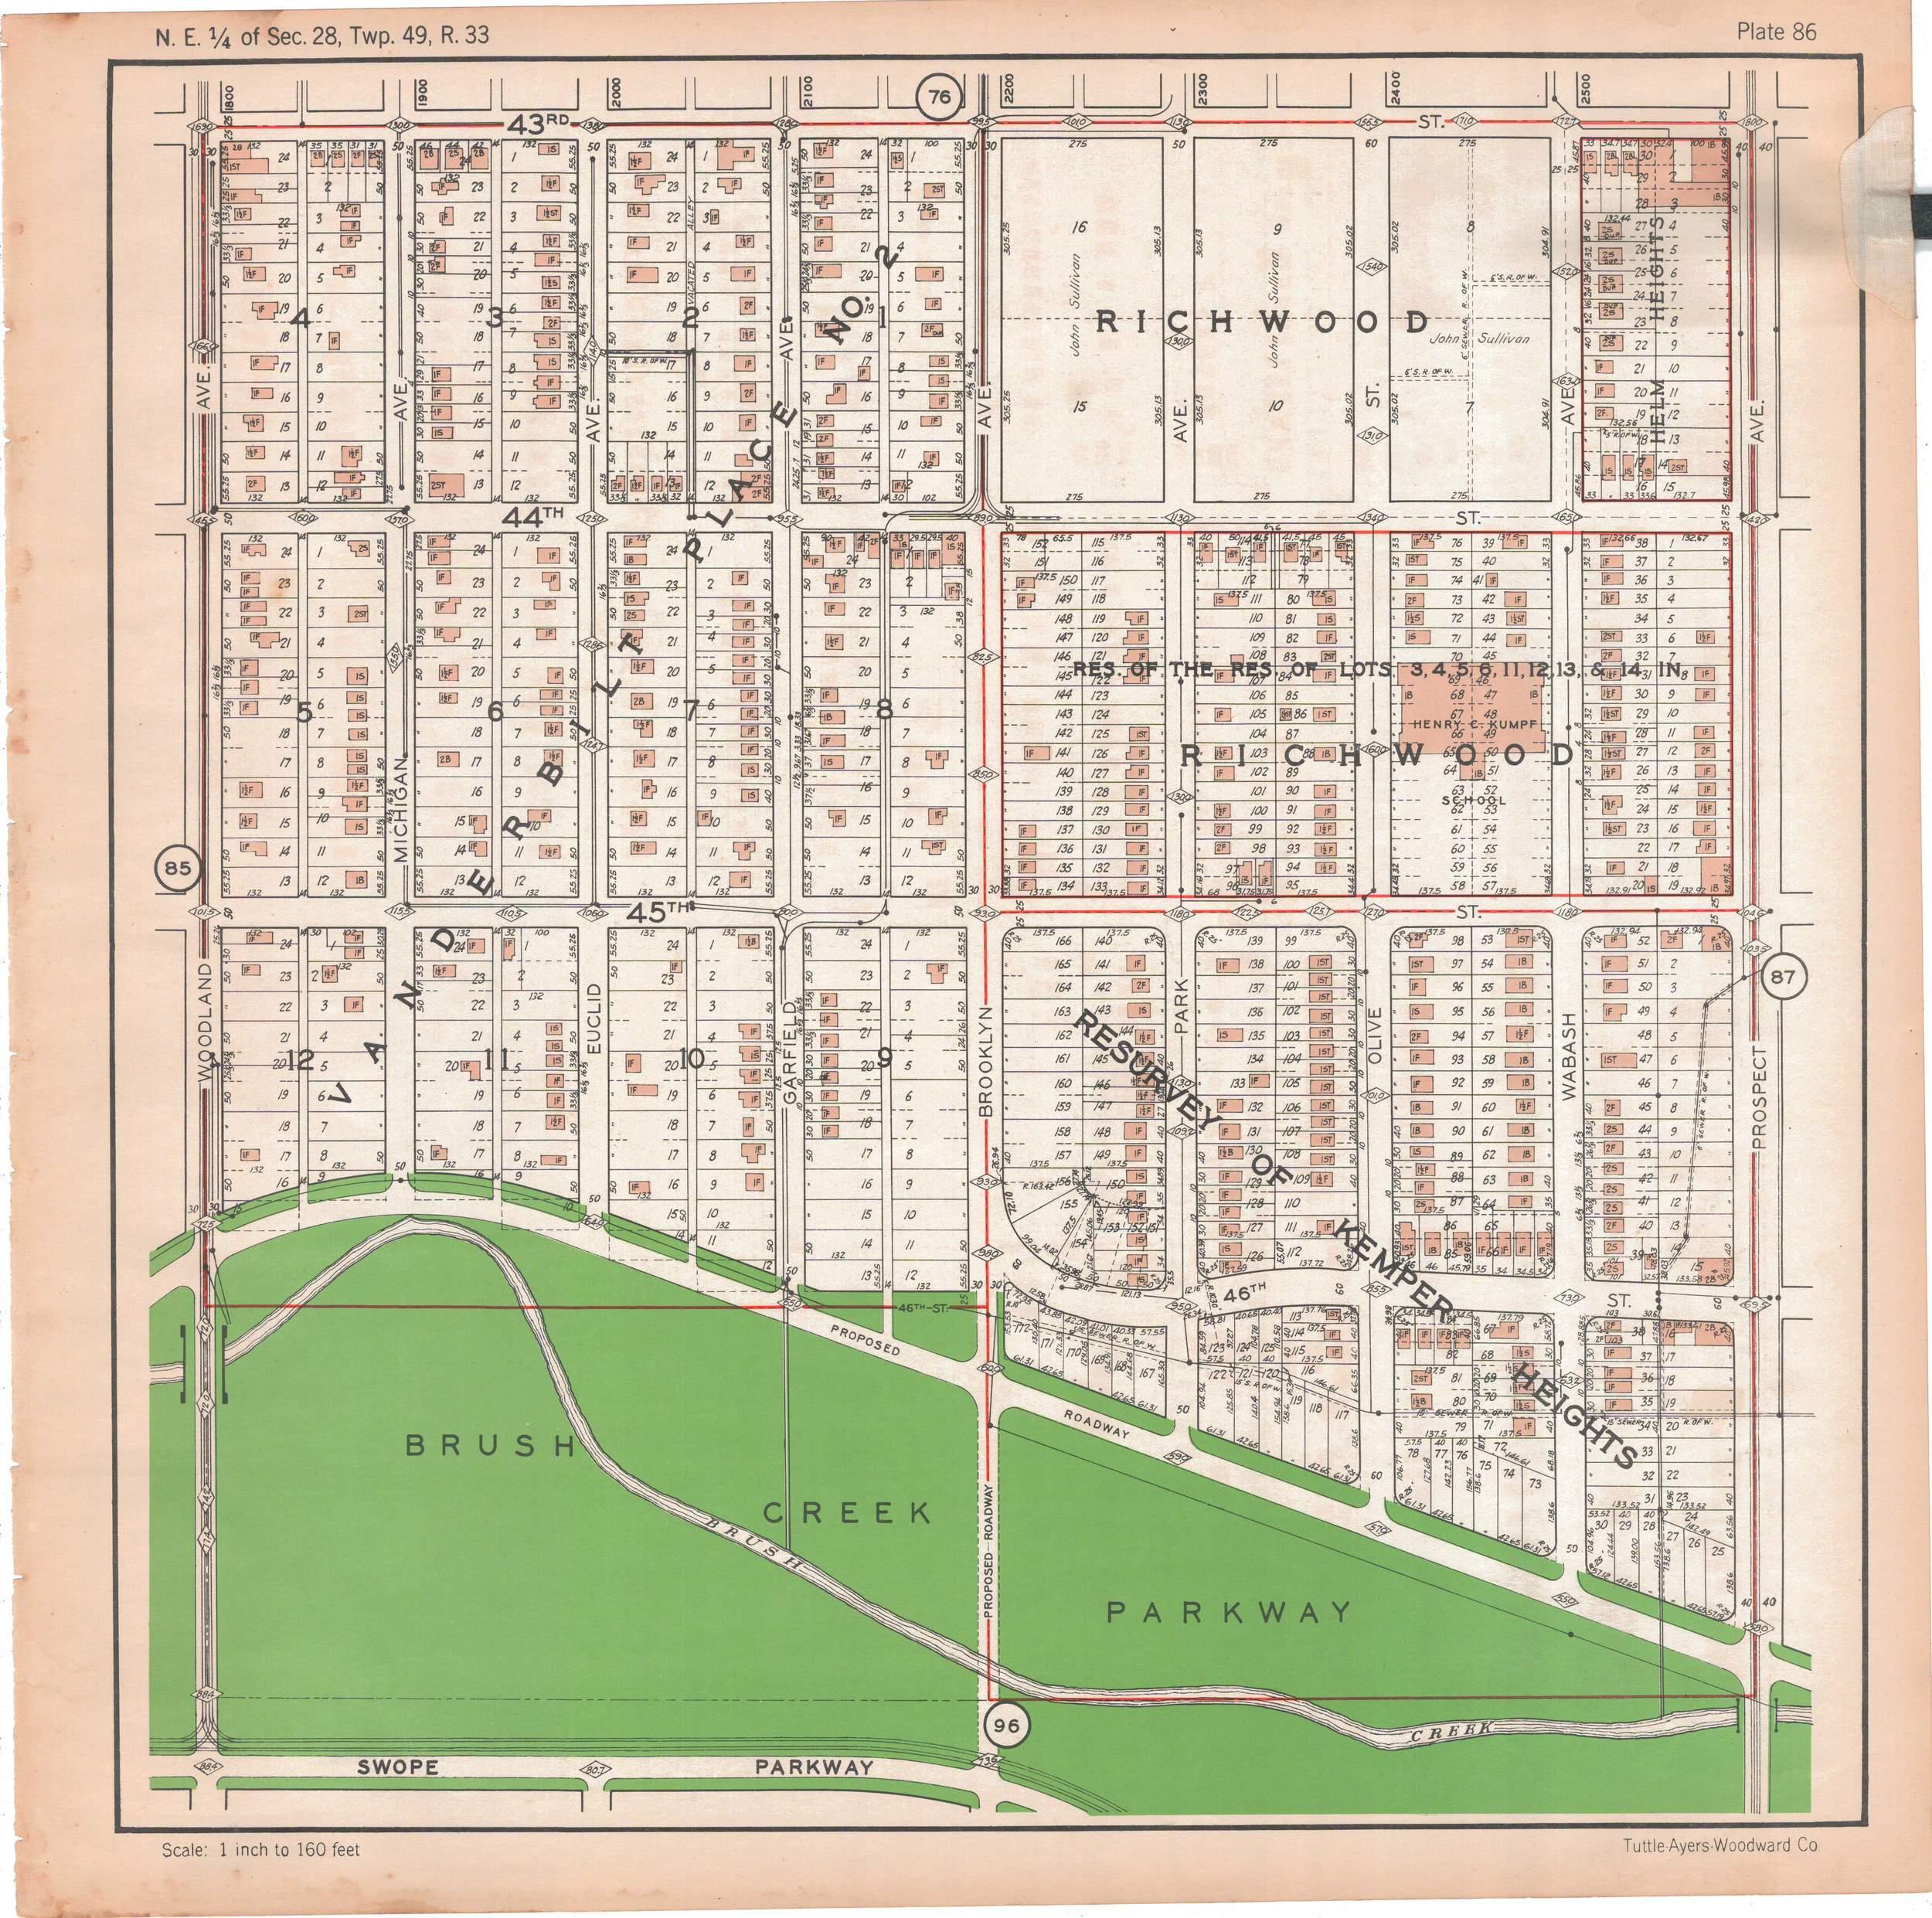 1925 TUTTLE_AYERS_Plate 86.JPG